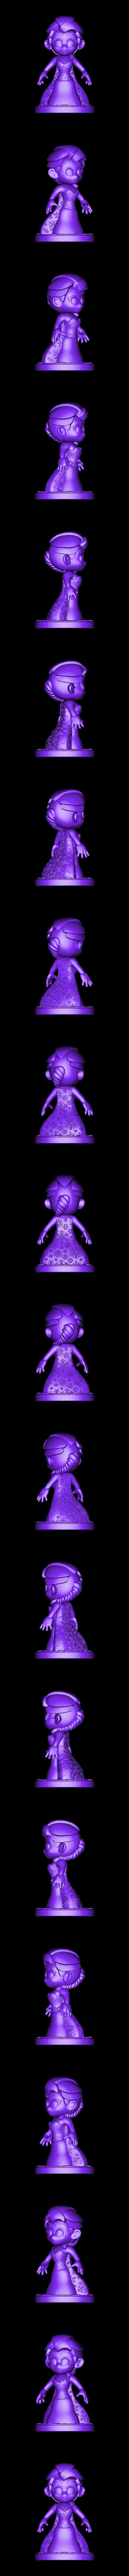 ElsaFrozen.stl Descargar archivo STL Elsa chibi ( Congelado ) • Modelo para la impresora 3D, MatteoMoscatelli